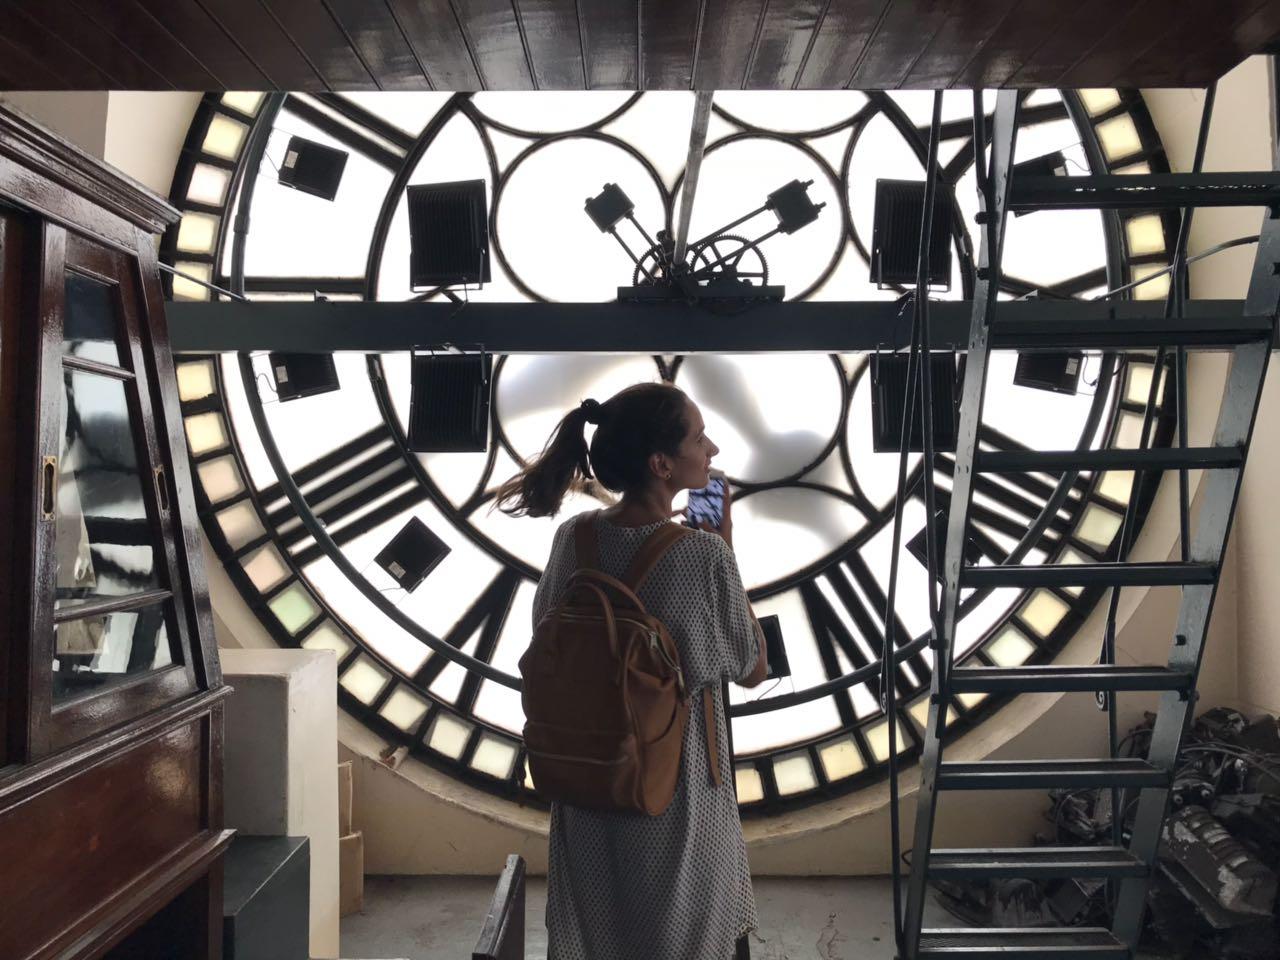 reloj torre de los ingleses monumental